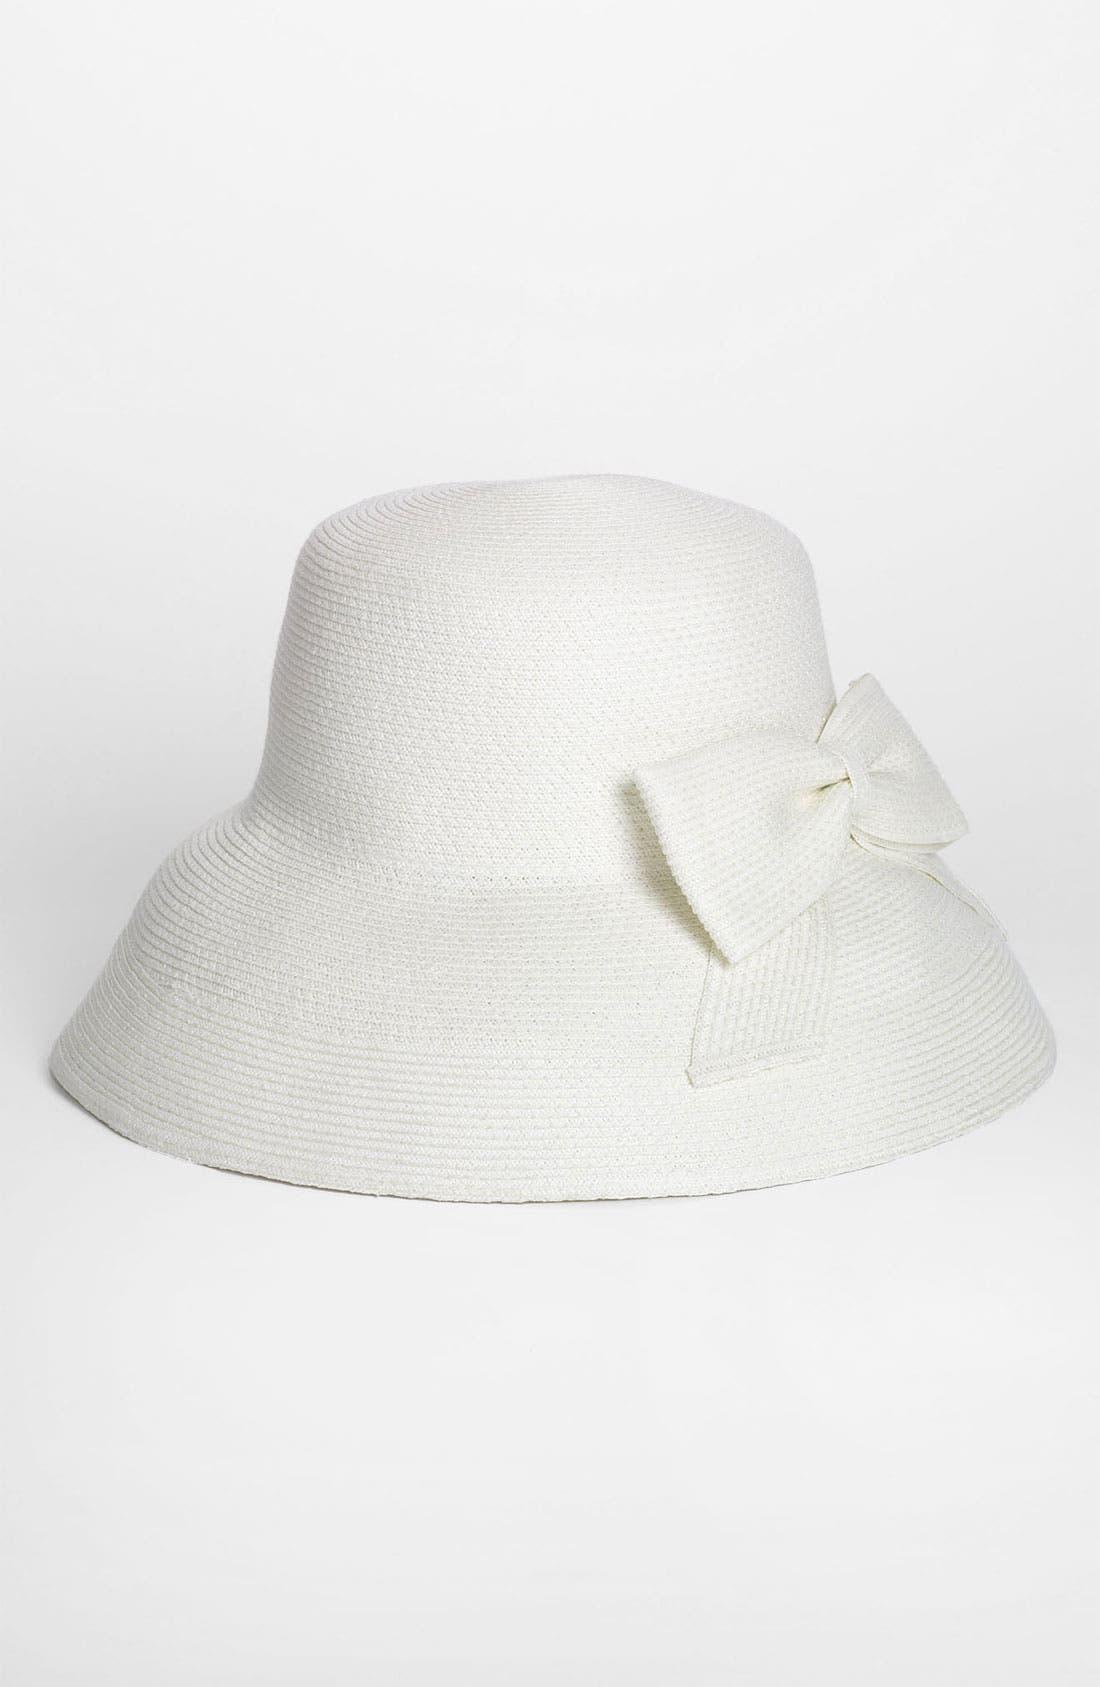 Alternate Image 1 Selected - Nordstrom Hat